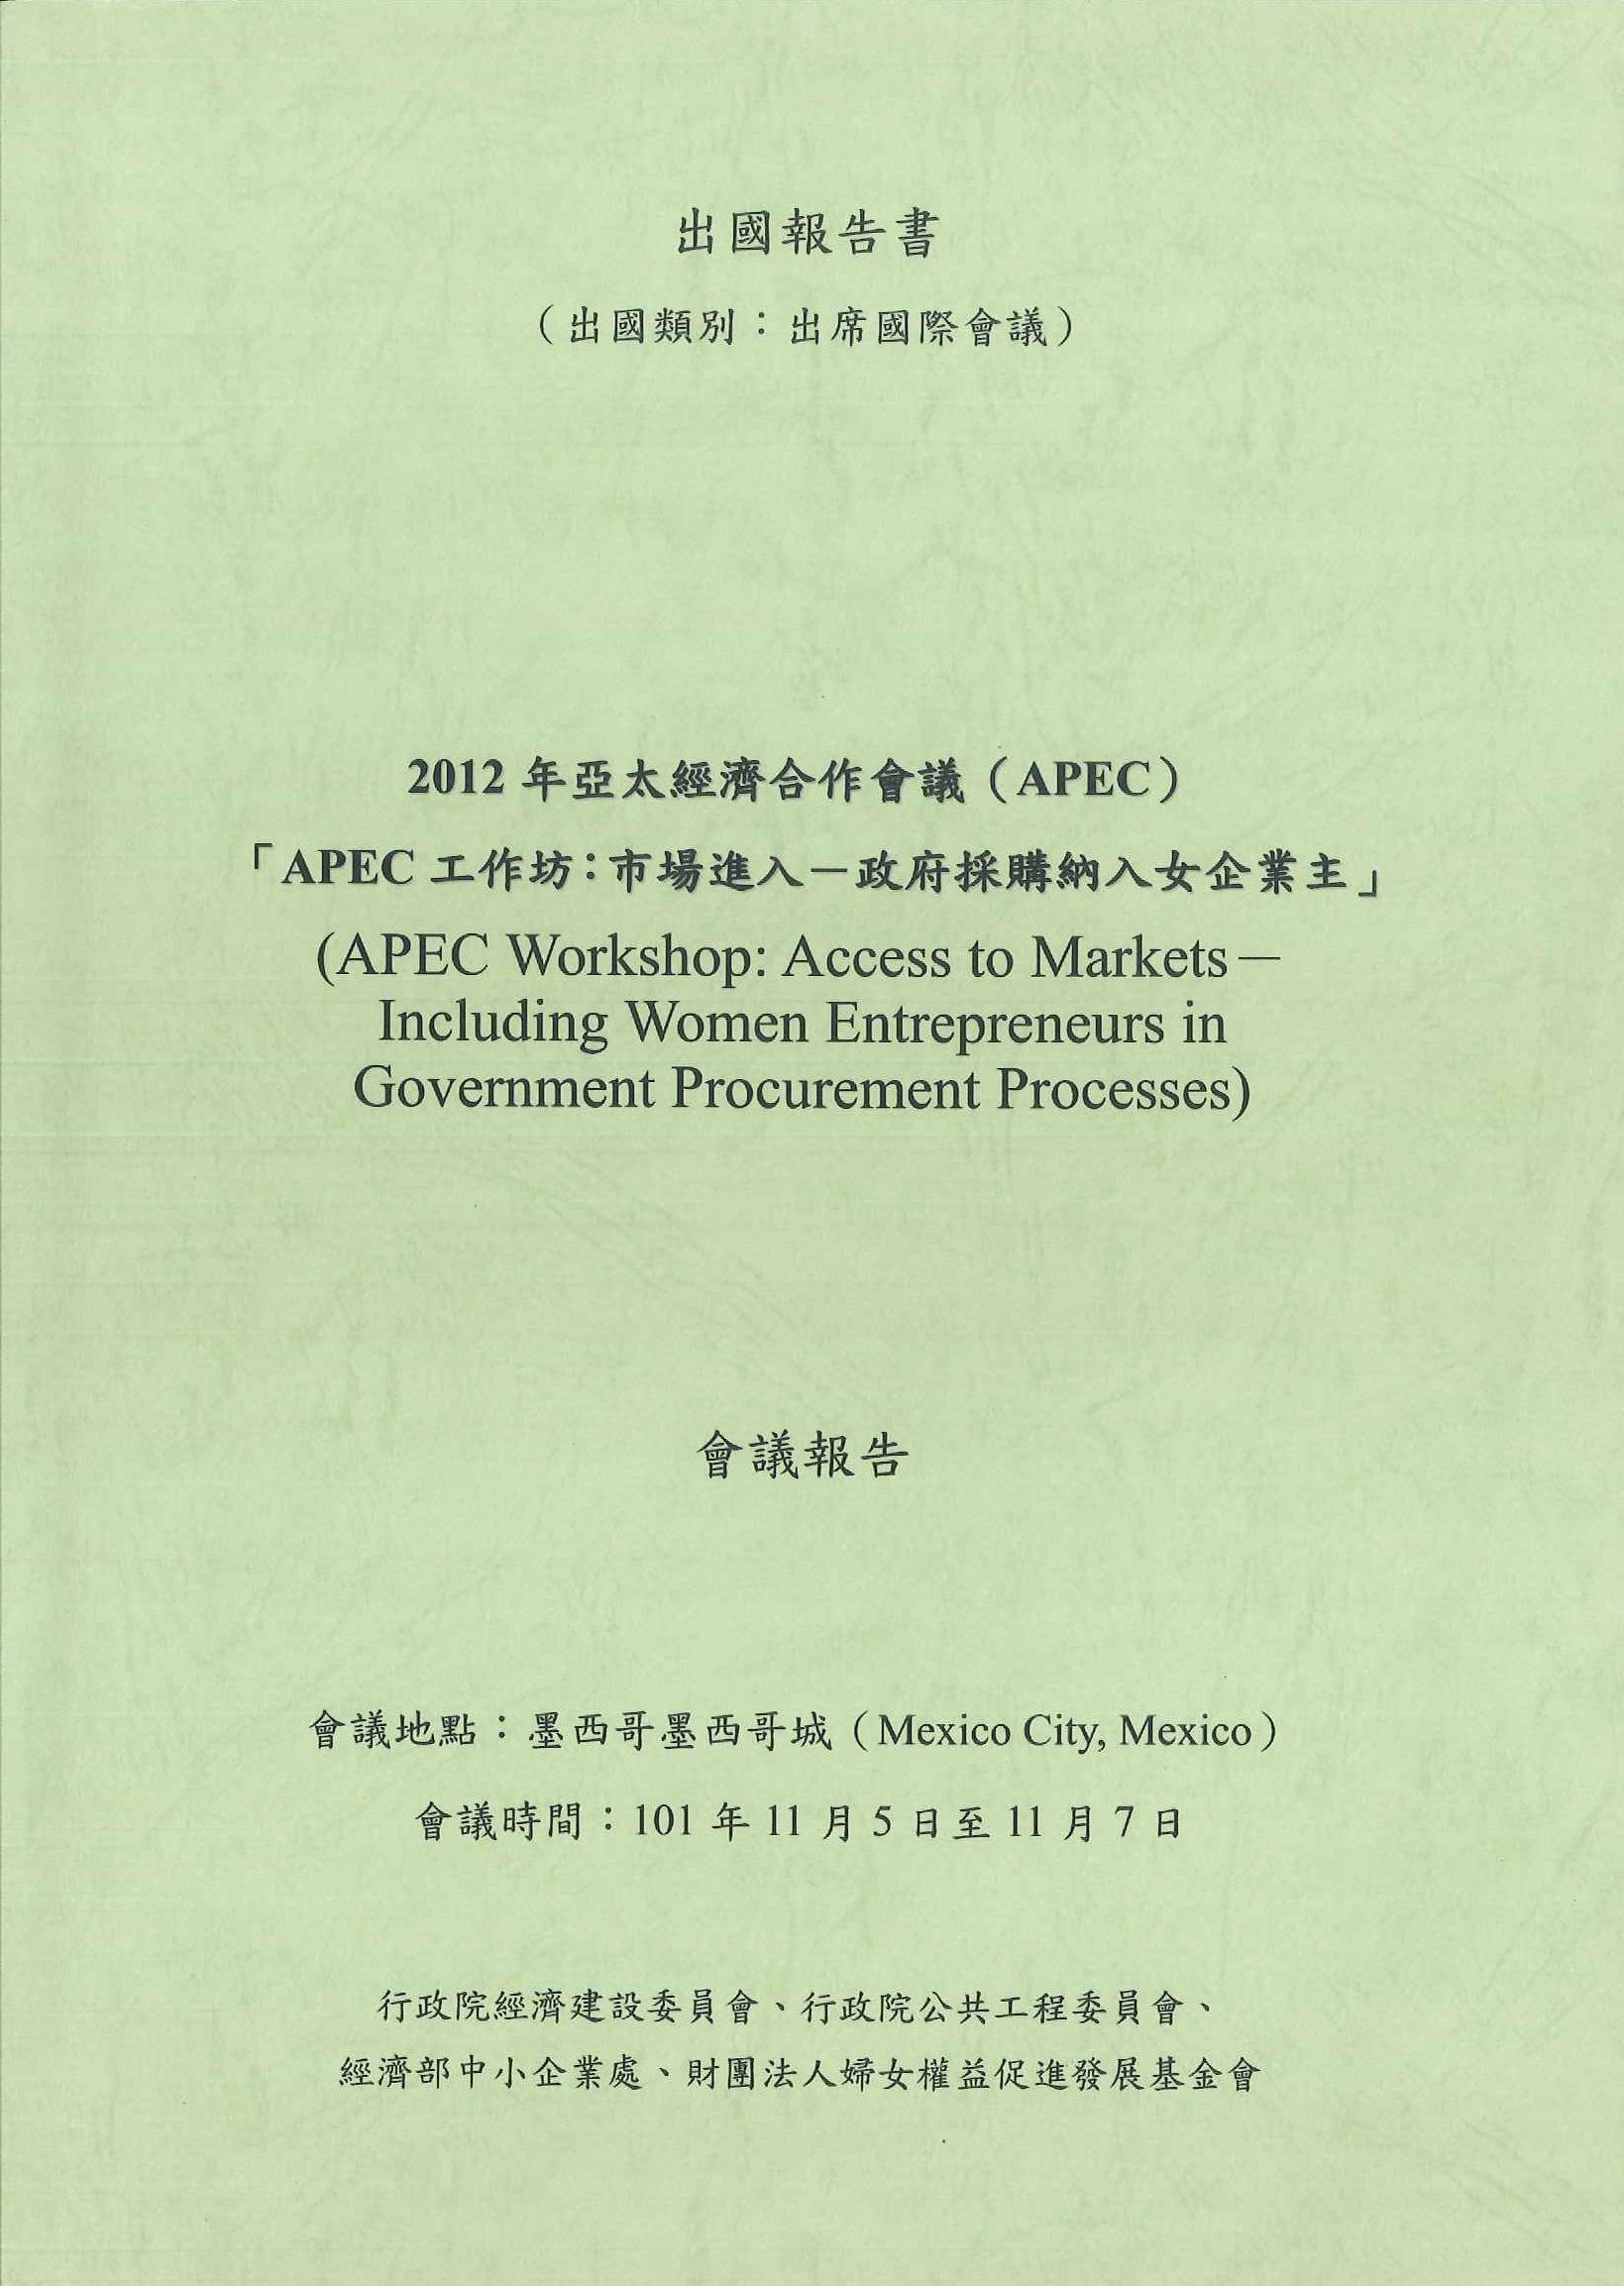 2012年亞太經濟合作會議(APEC):「APEC工作坊:市場進入-政府採購納入女企業主」會議報告=APEC workshop: access to markets-including women entrepreneurs in government procurement processes